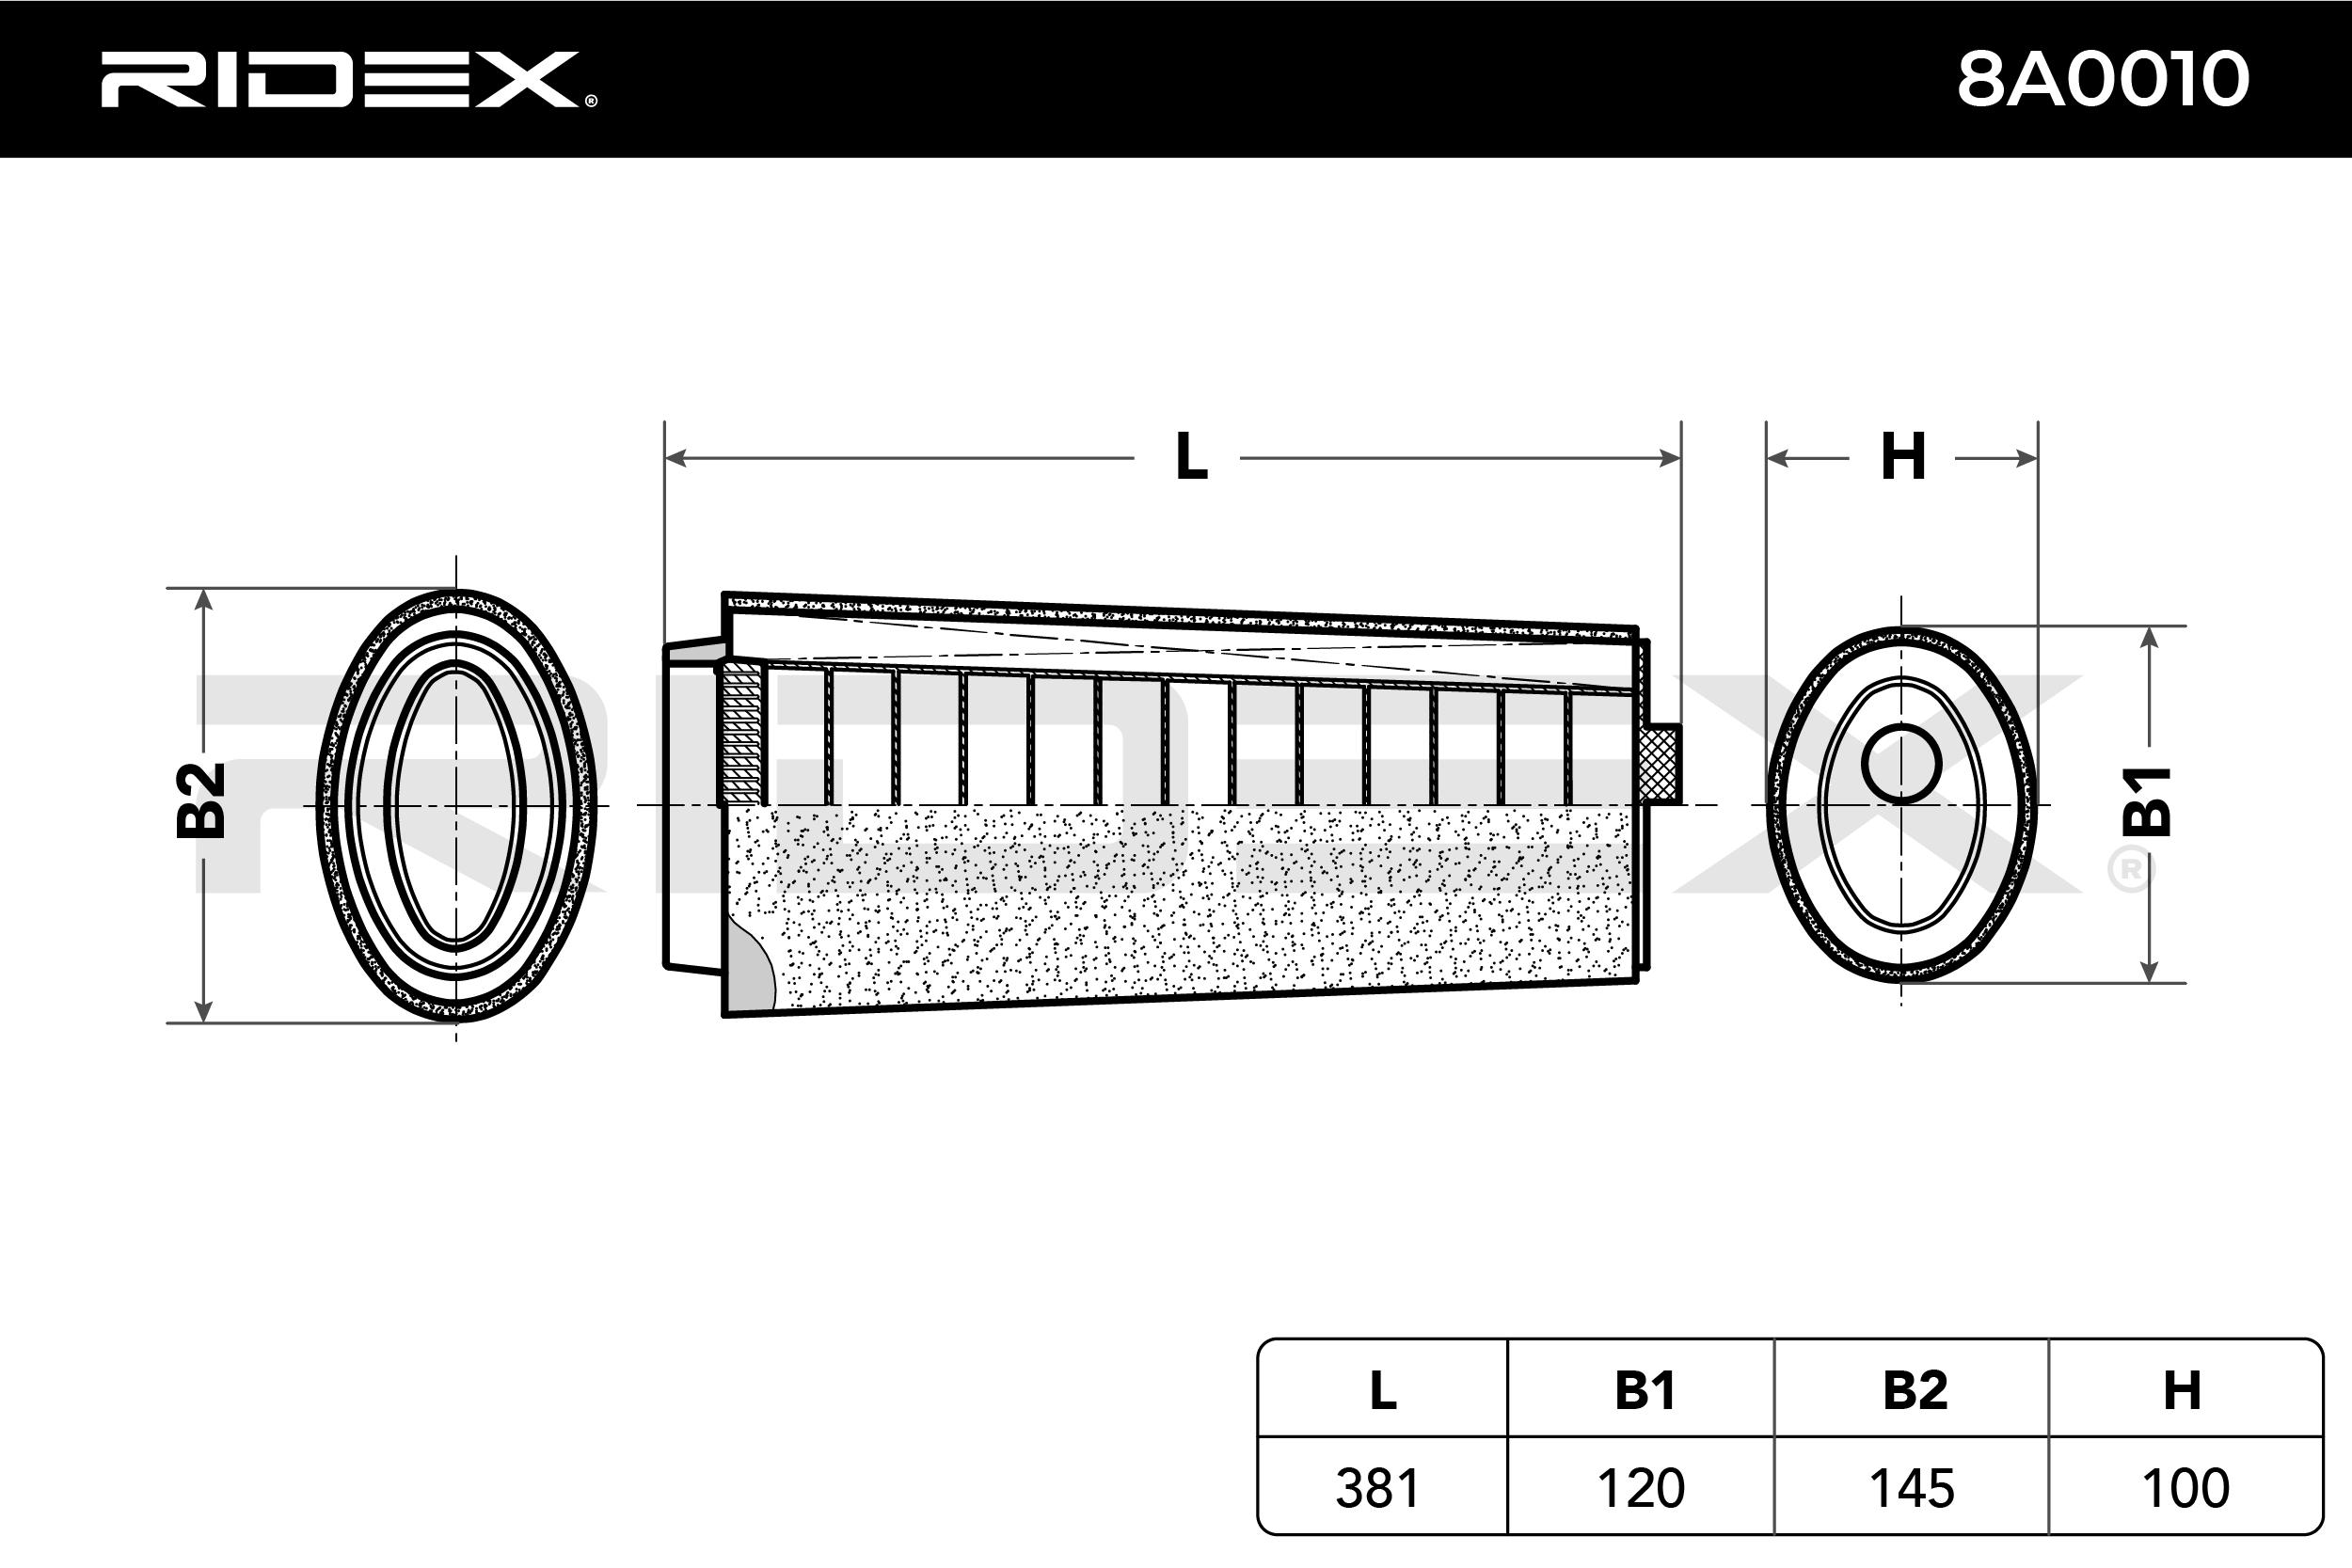 RIDEX Art. Nr 8A0010 günstig